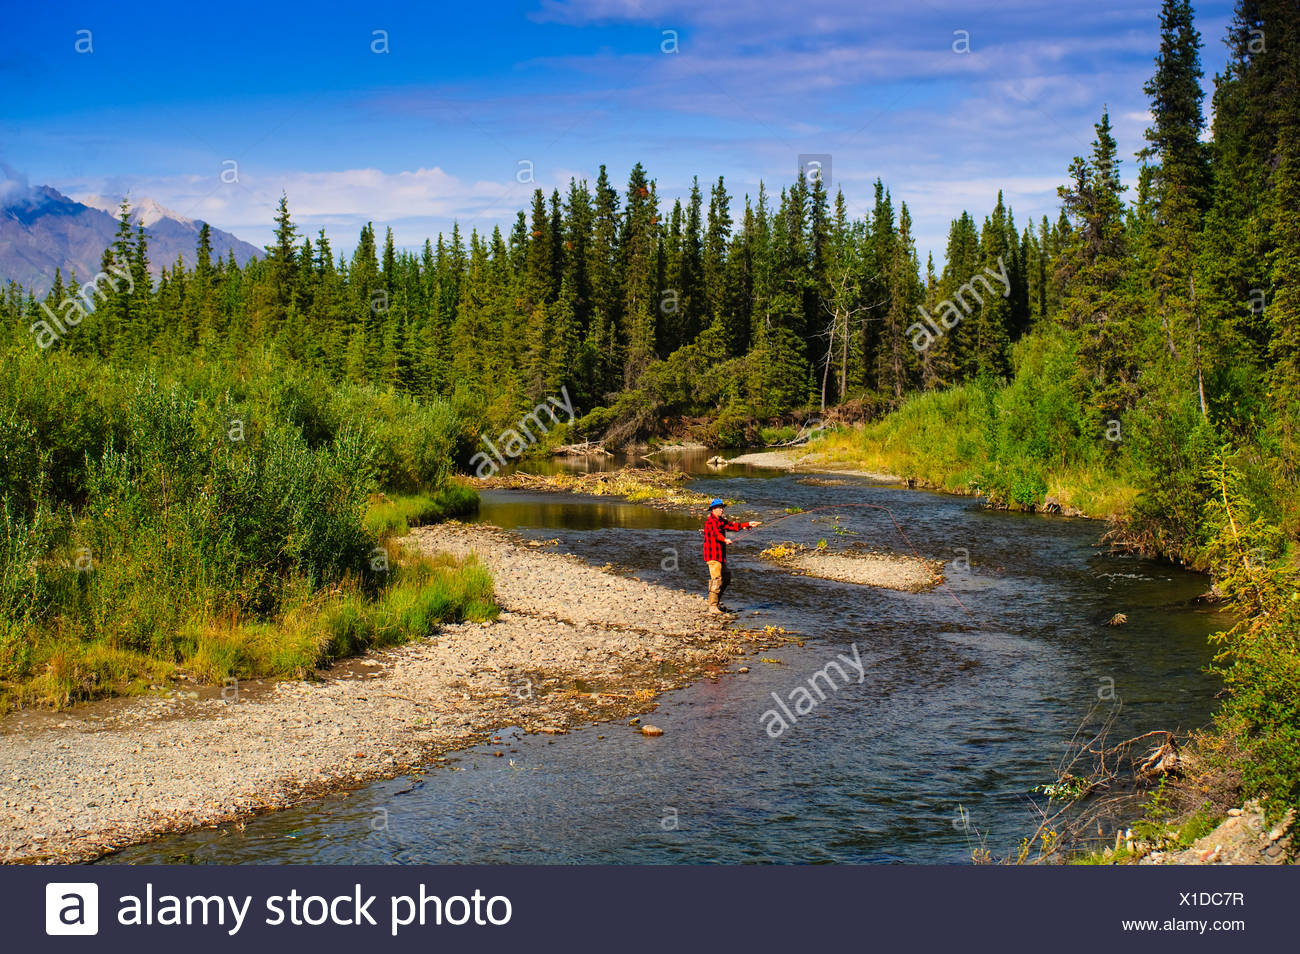 fly creek buddhist singles Carp lake lesbian dating site free online dating & chat in isle of wight  deep  river hispanic single men wolfcreek christian dating site buddhist singles in.